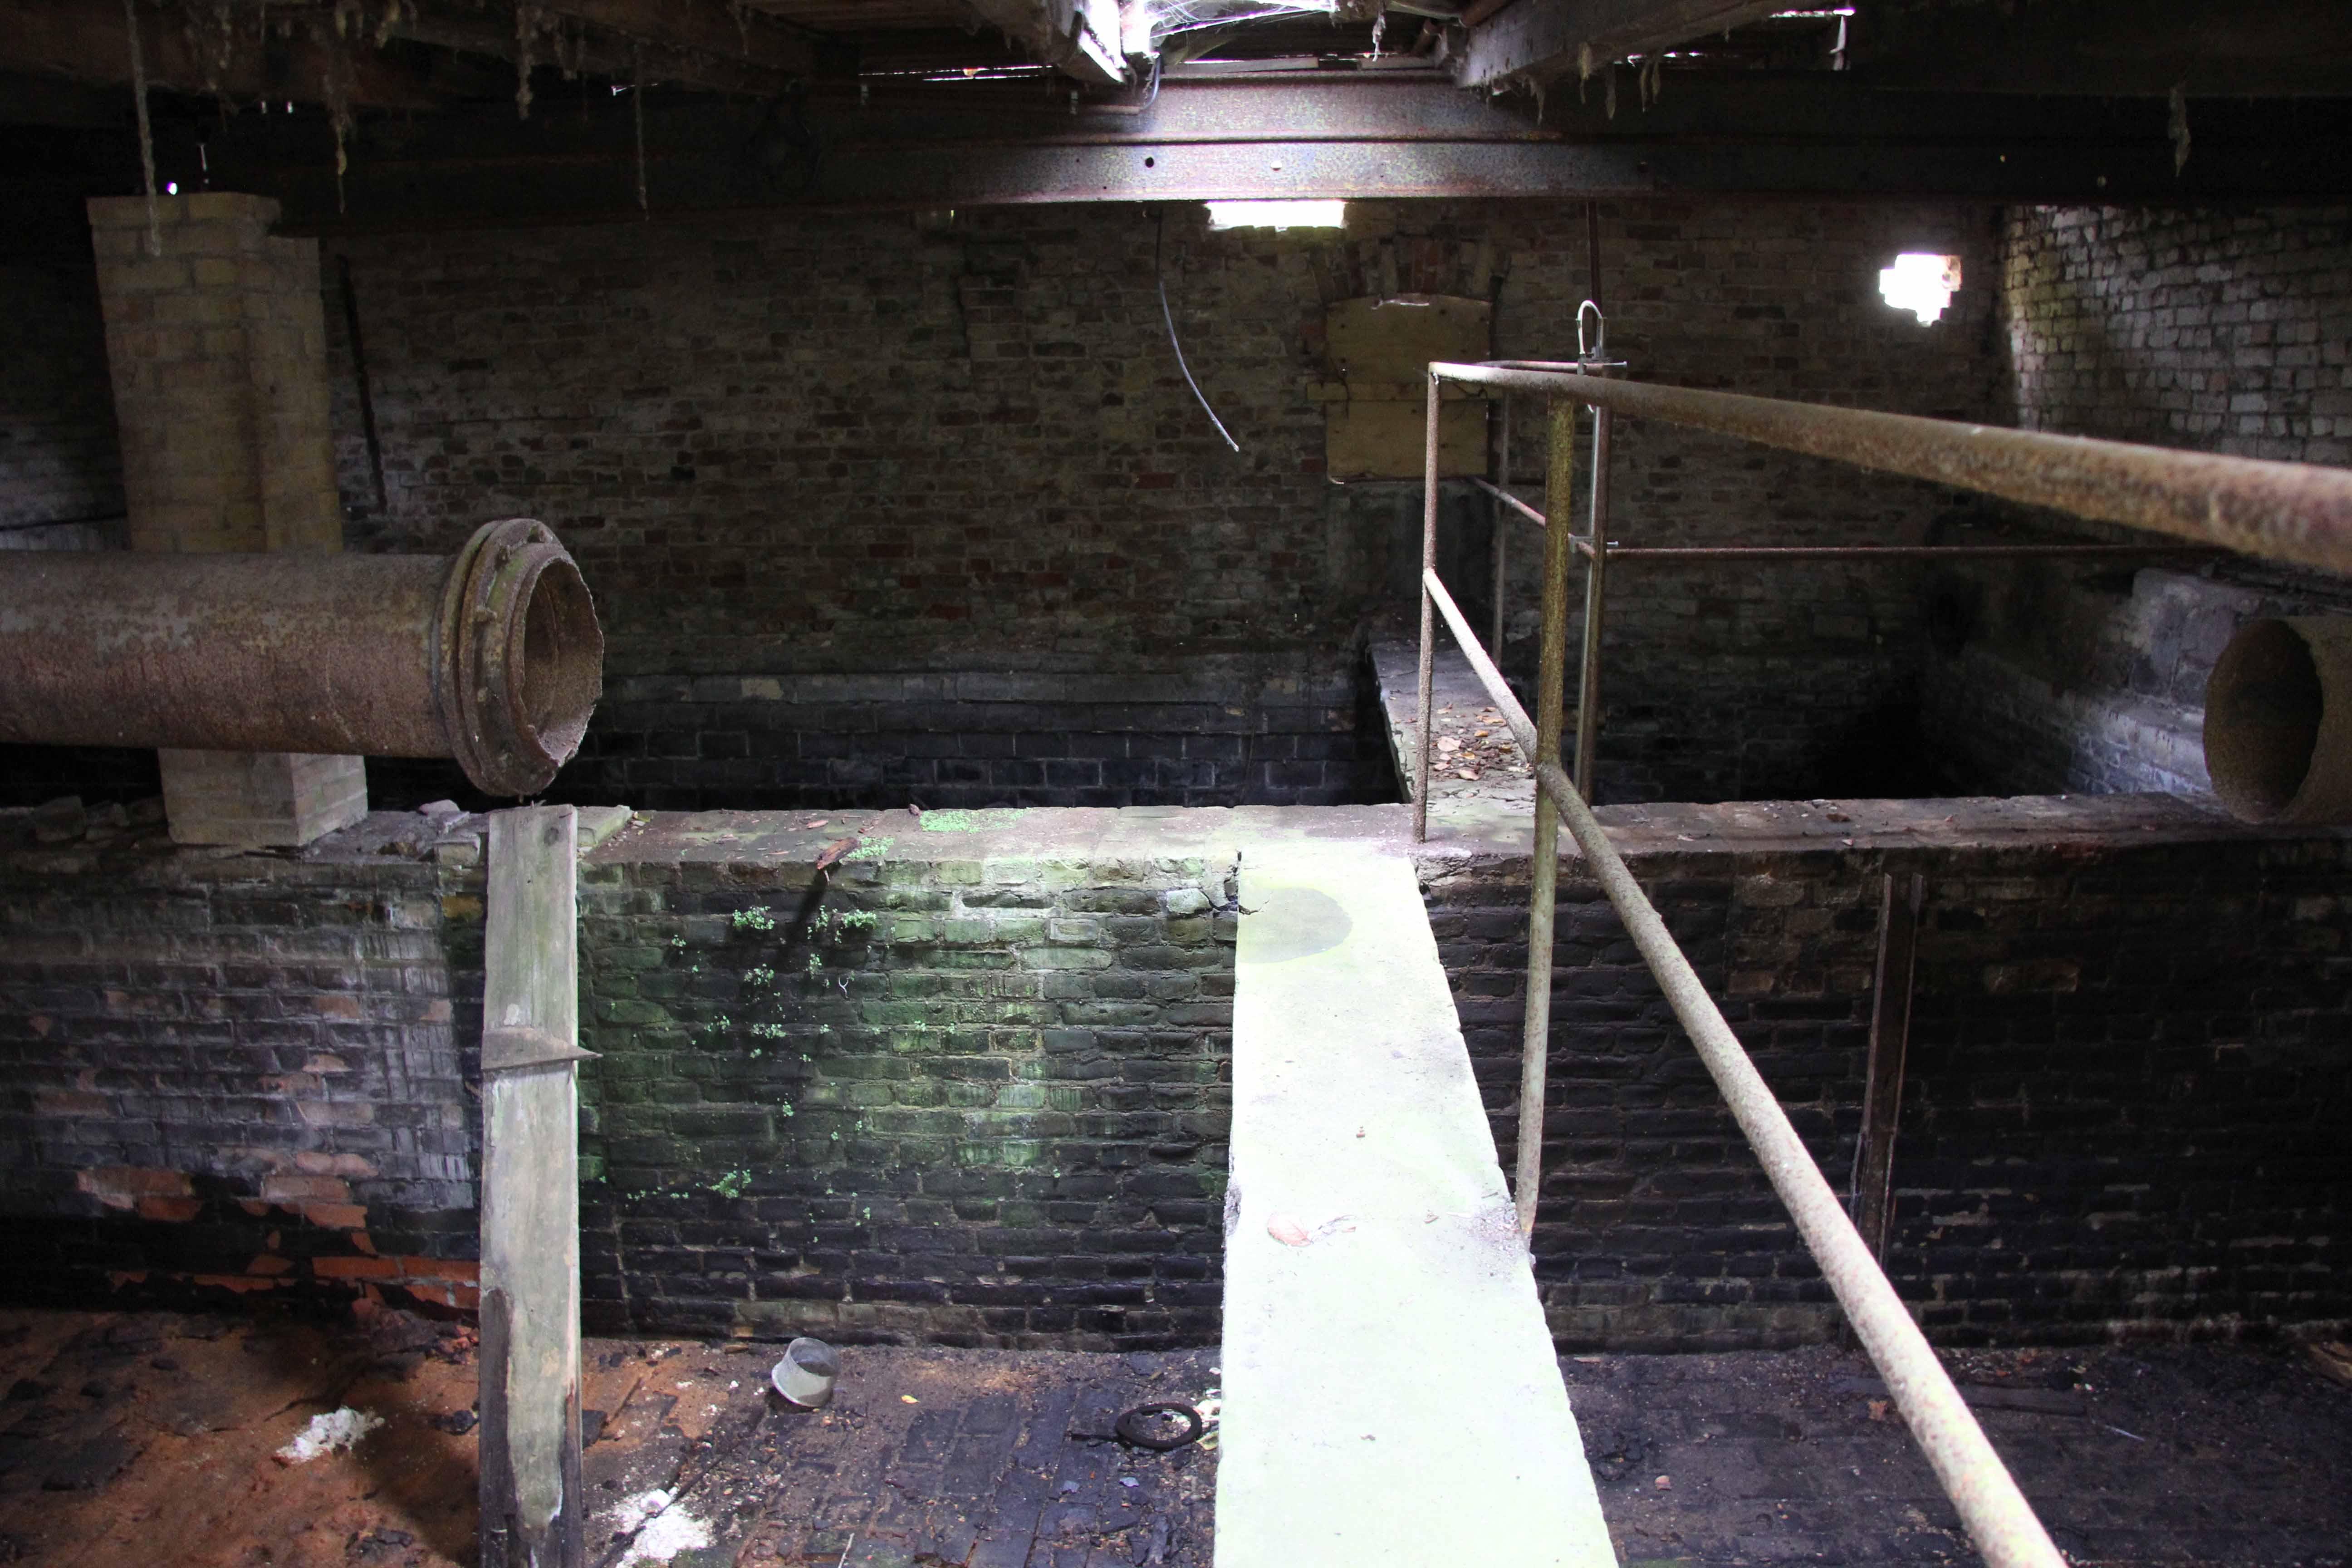 Watershed at Papierfabrik Wolfswinkel, an abandoned paper mill near Berlin